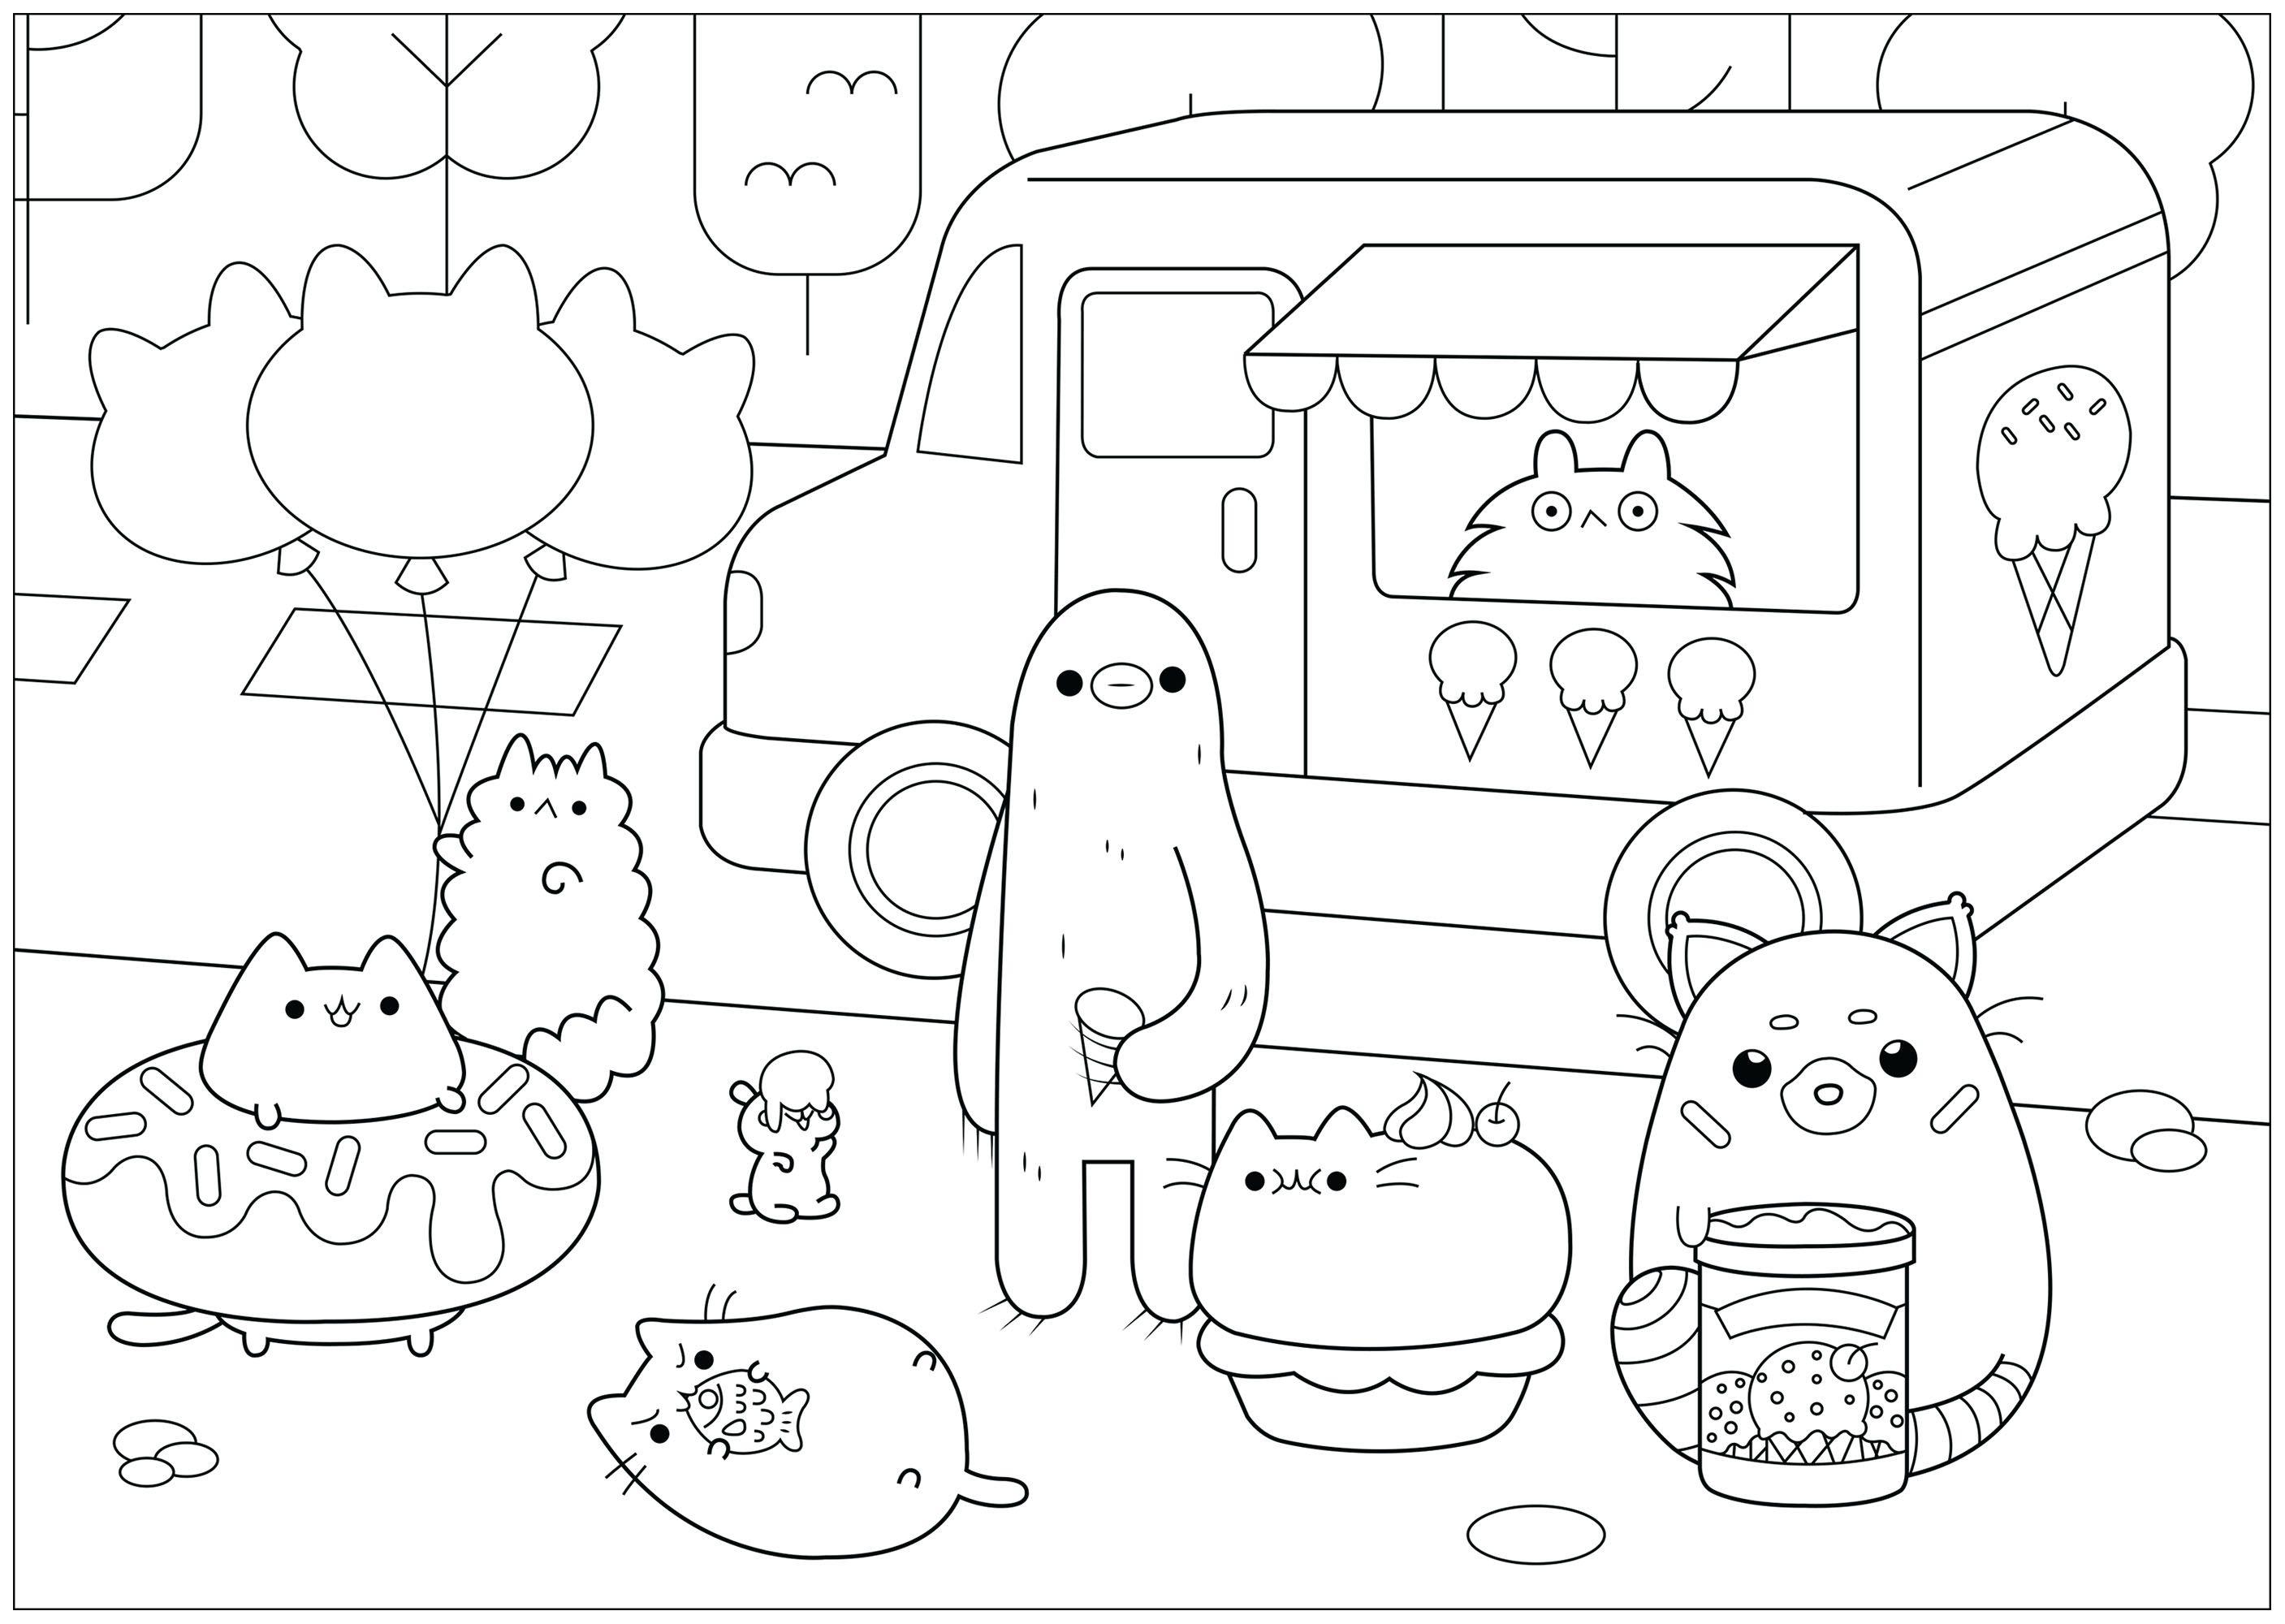 Ice cream shop Pusheen - Doodle Art / Doodling Coloring ...